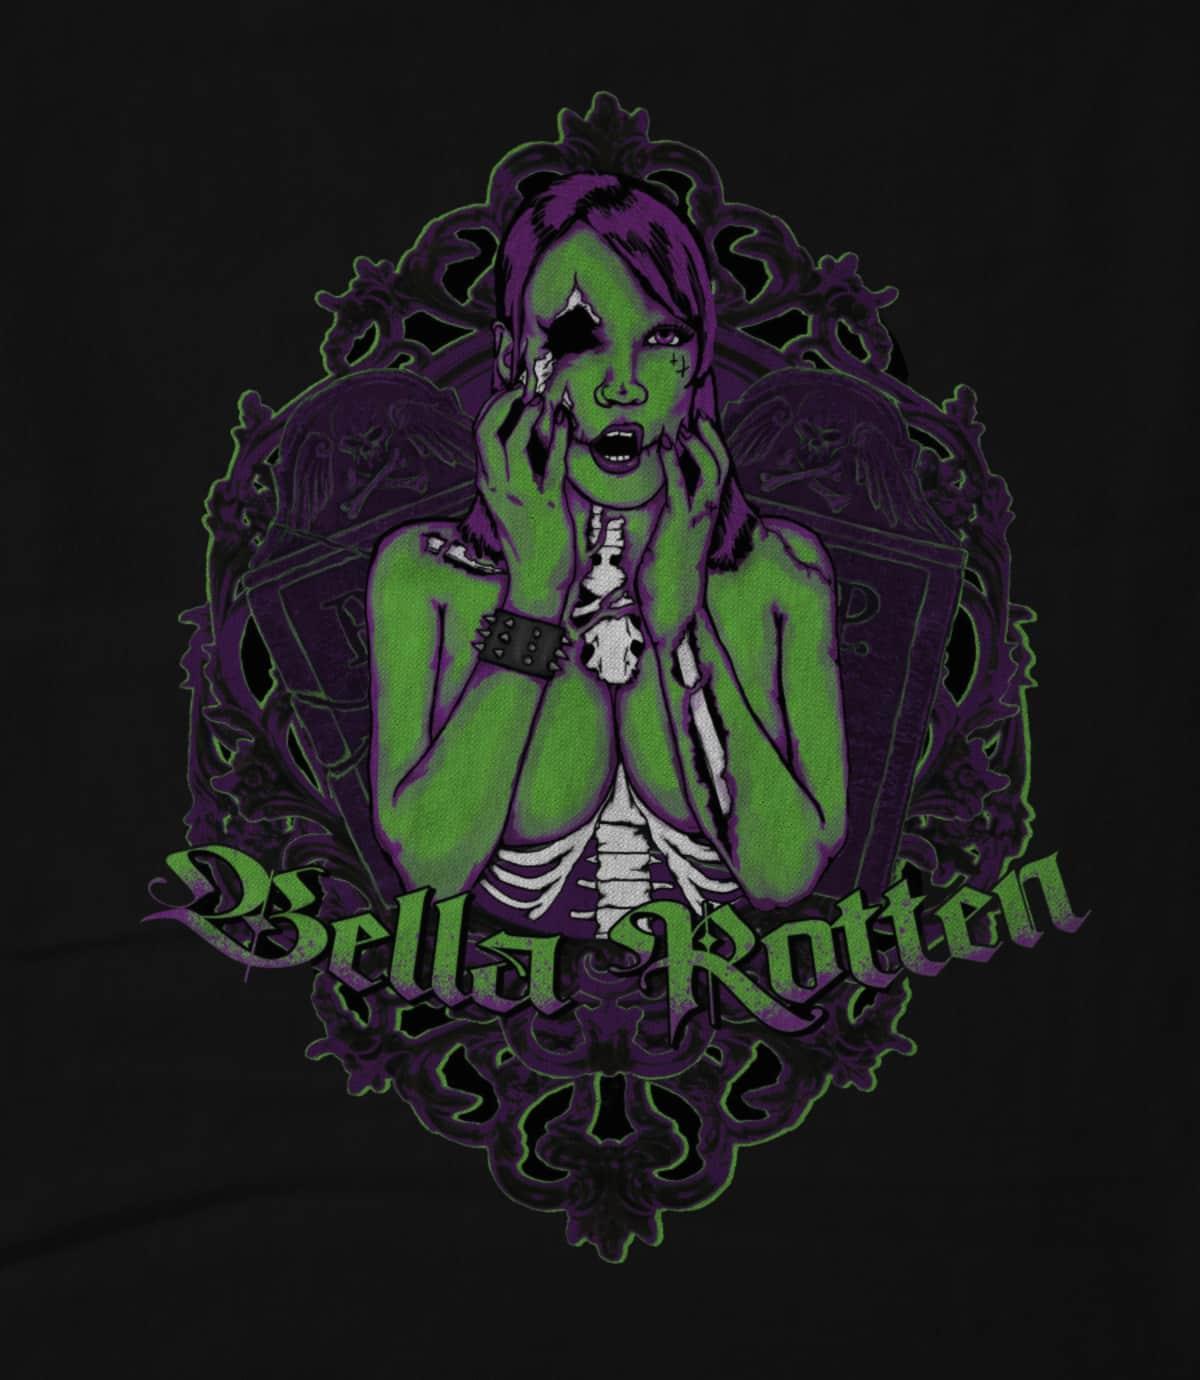 Bella rotten rotten  black  1595806671